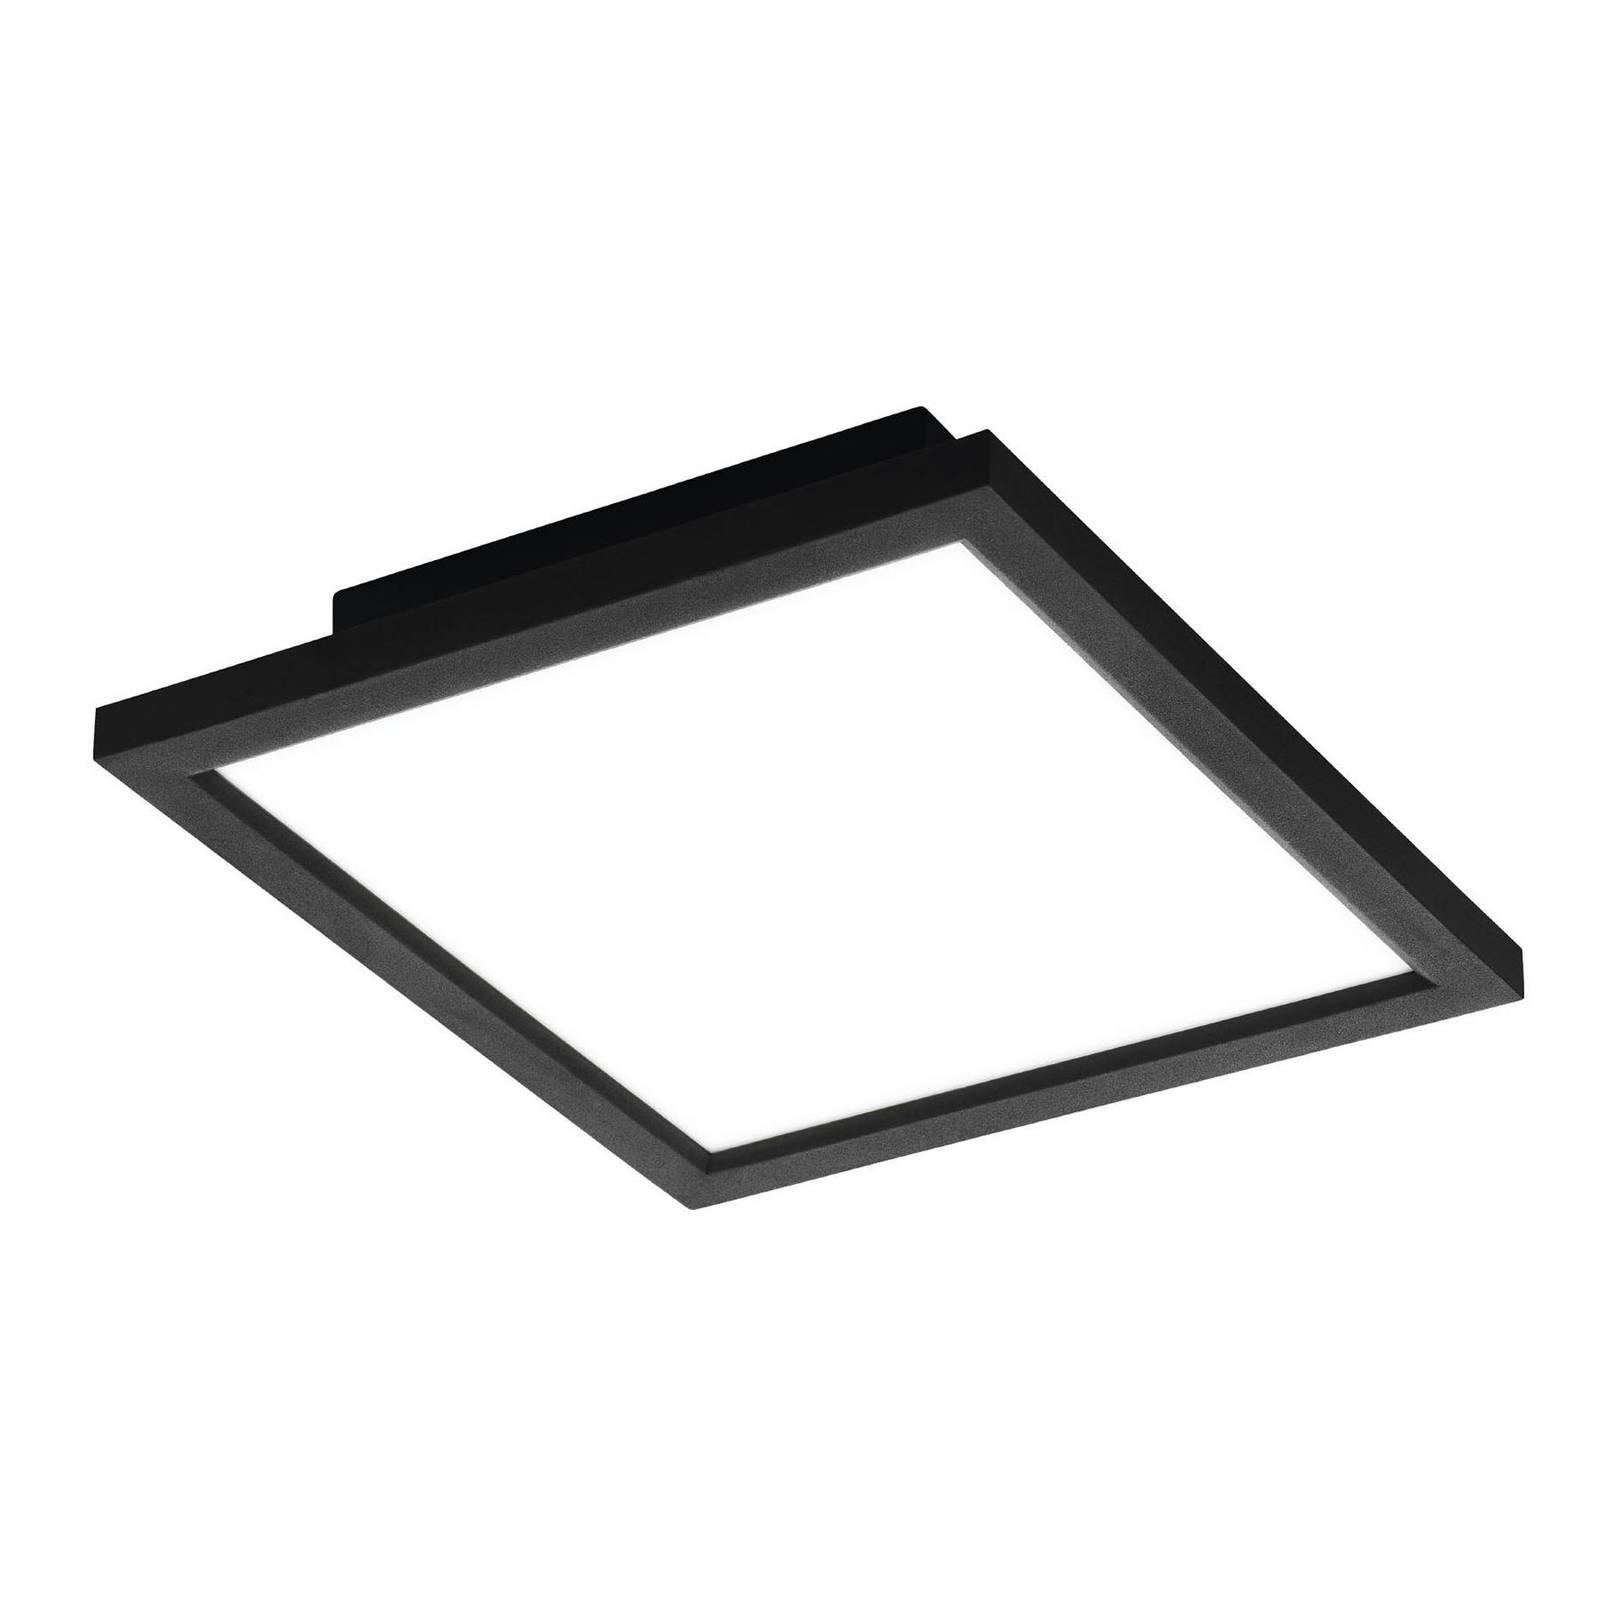 EGLO connect Salobrena-C-LED-paneeli musta 30x30cm